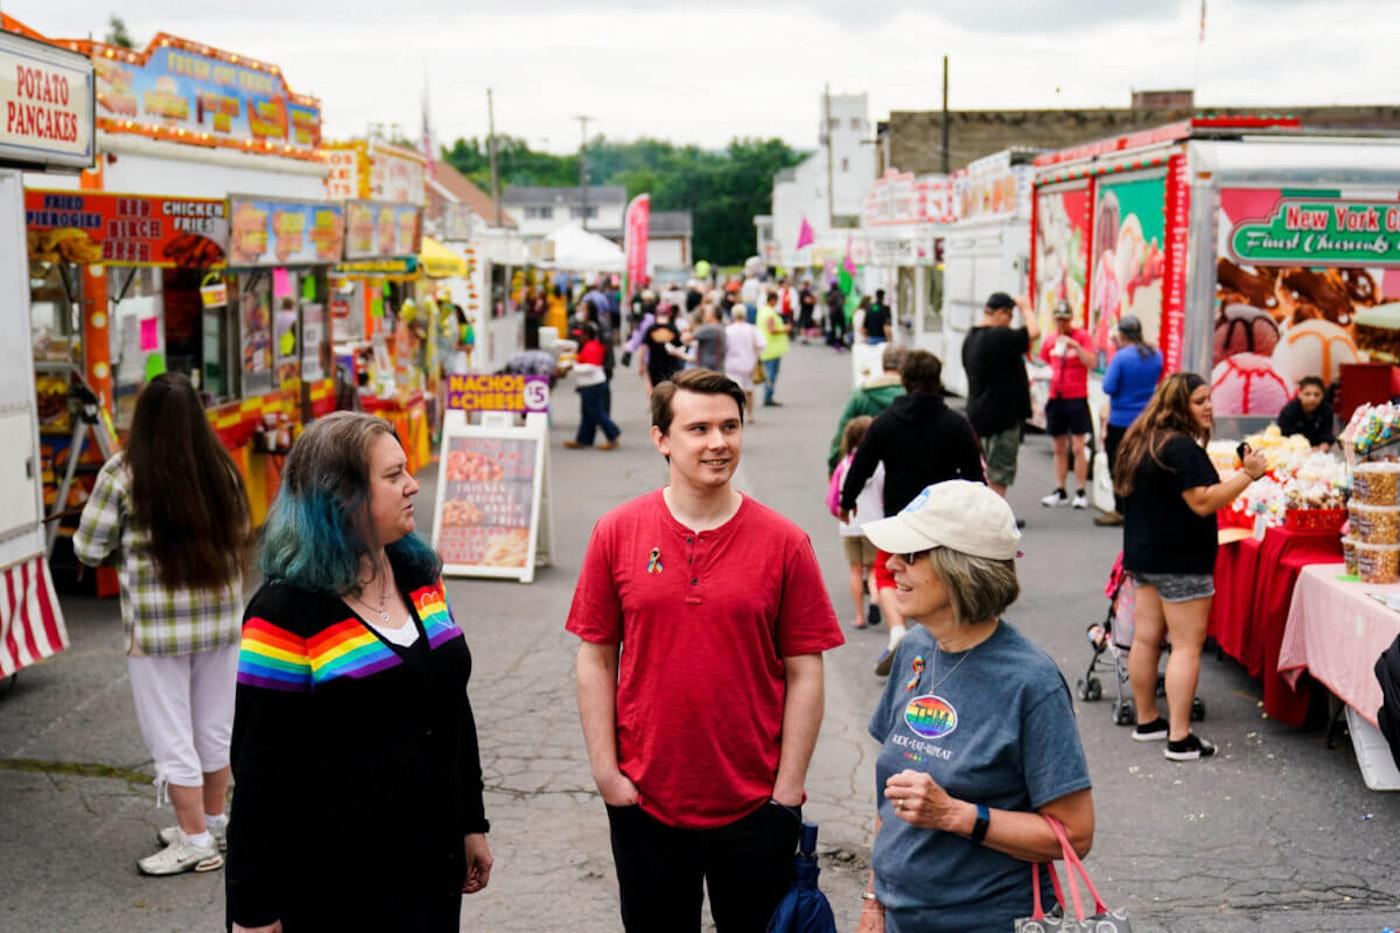 Alisha Hoffman-Mirilovich, left, Mark Shaffer, and Claudia Glennan visit with on another at the Edwardsville Pierogi Festival in Edwardsville, Pa., Friday, June 11, 2021. (AP Photo/Matt Rourke)